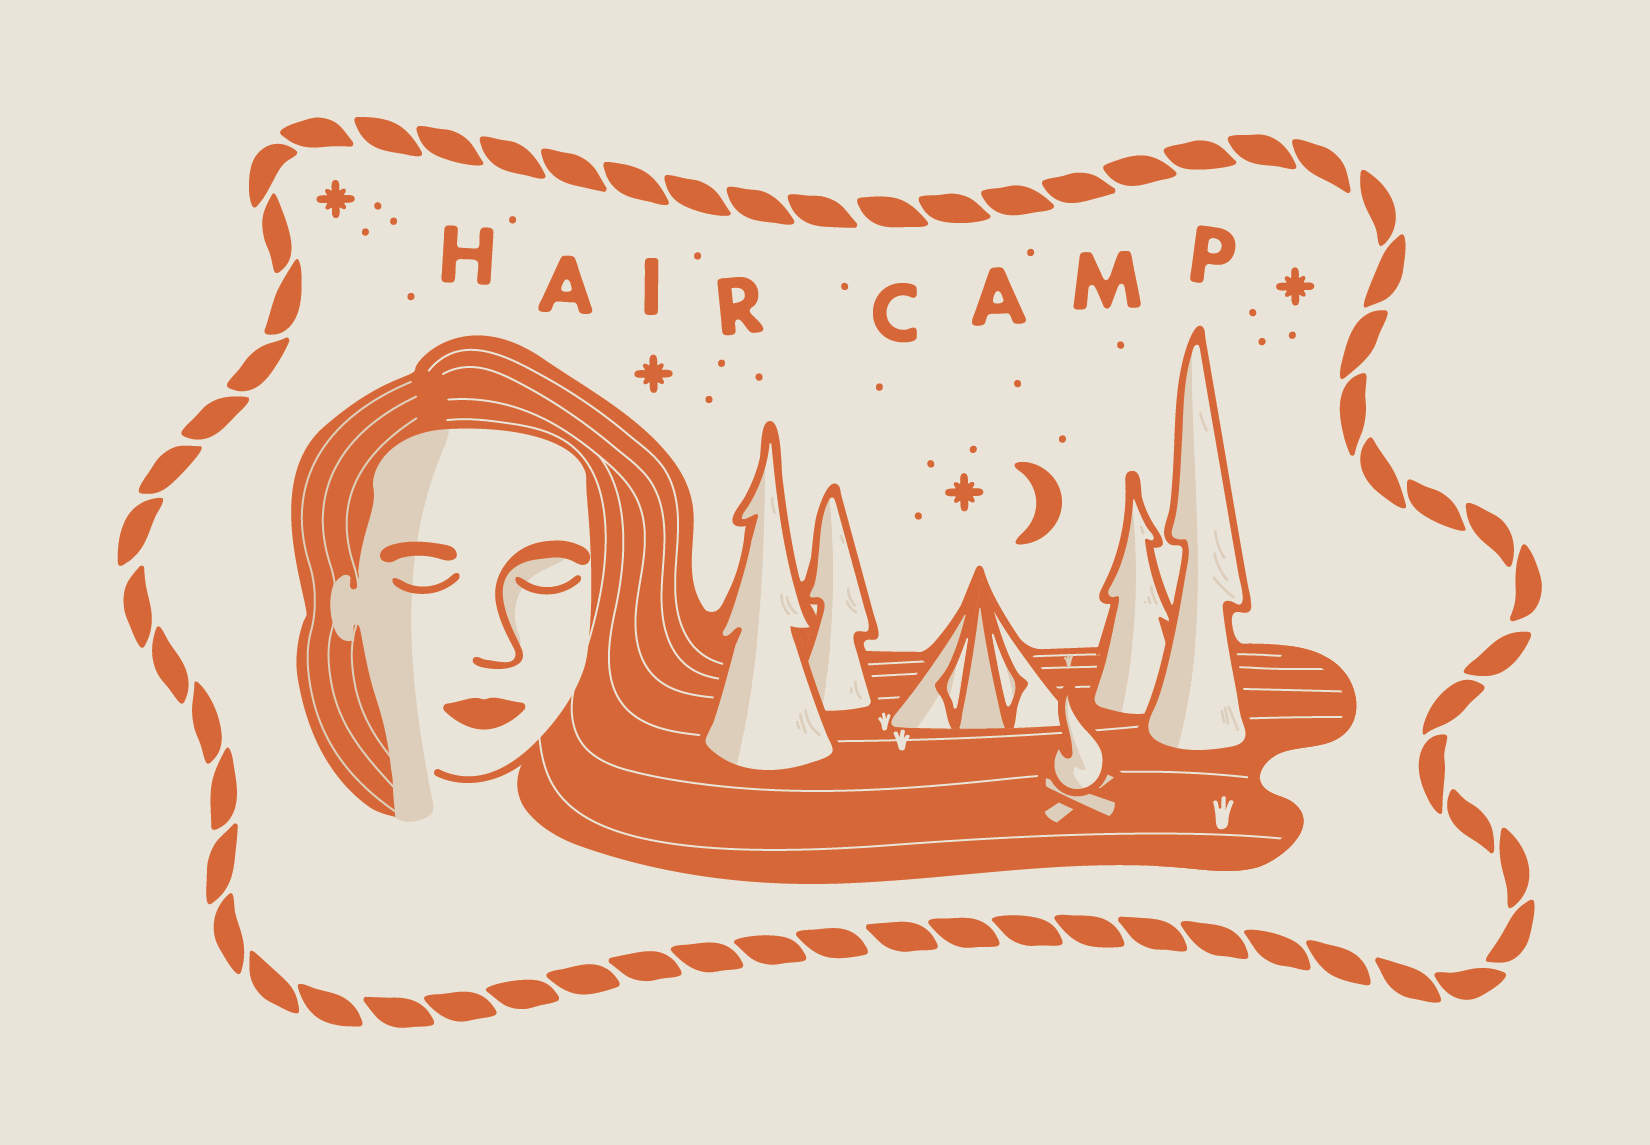 Hair Camp Illustration.jpg